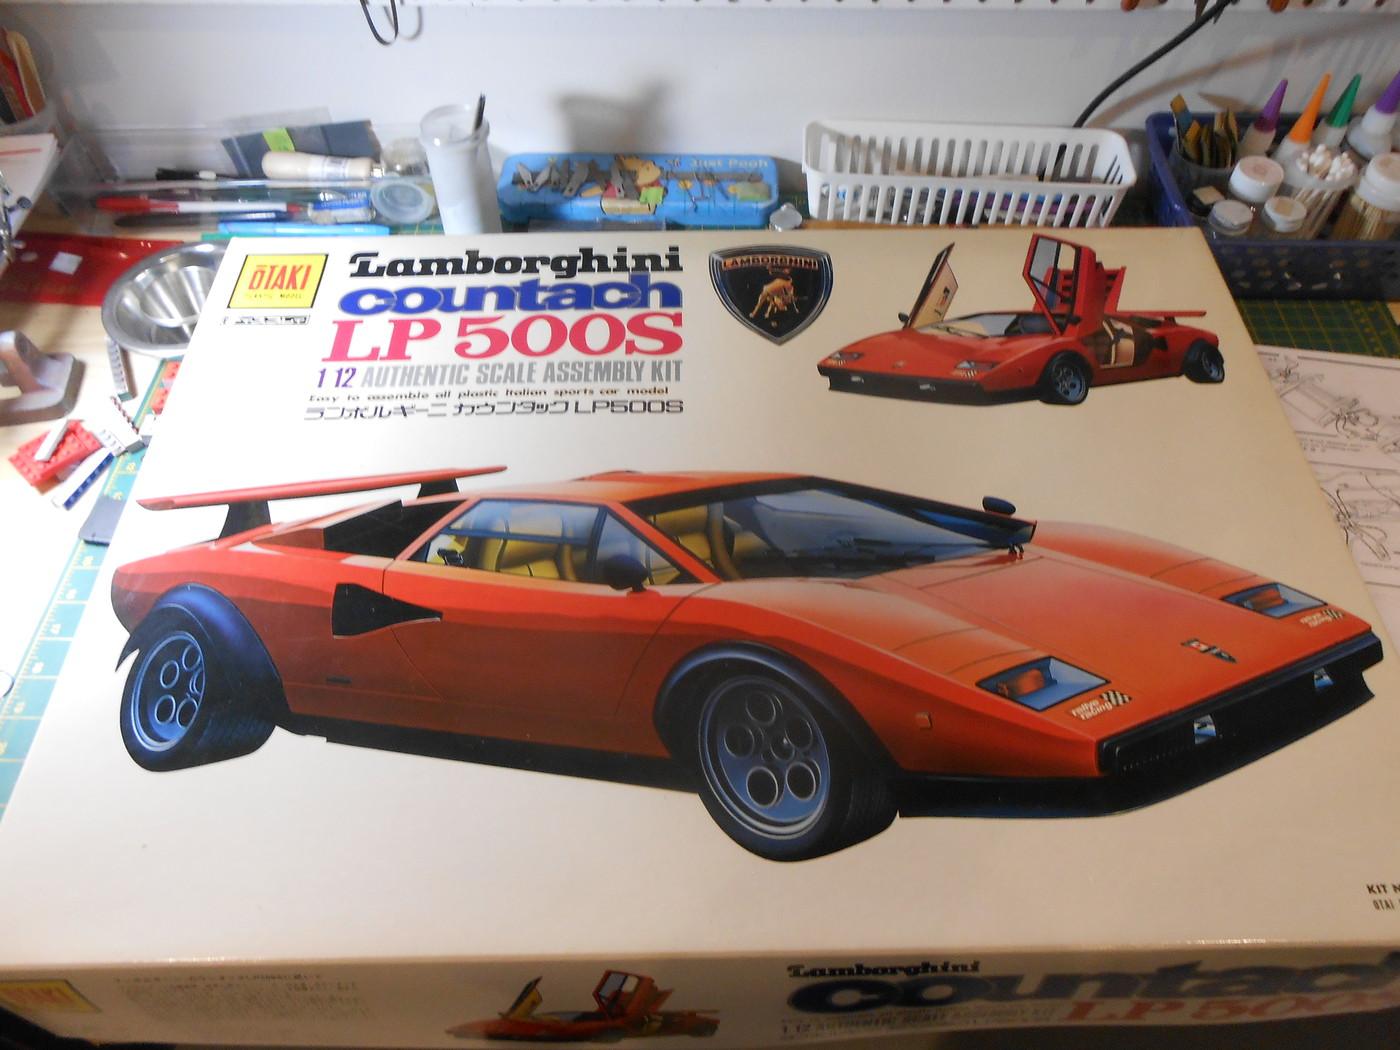 Lamborghini Countach LP500S 1/12 2v2EAr1NqxaTfRW